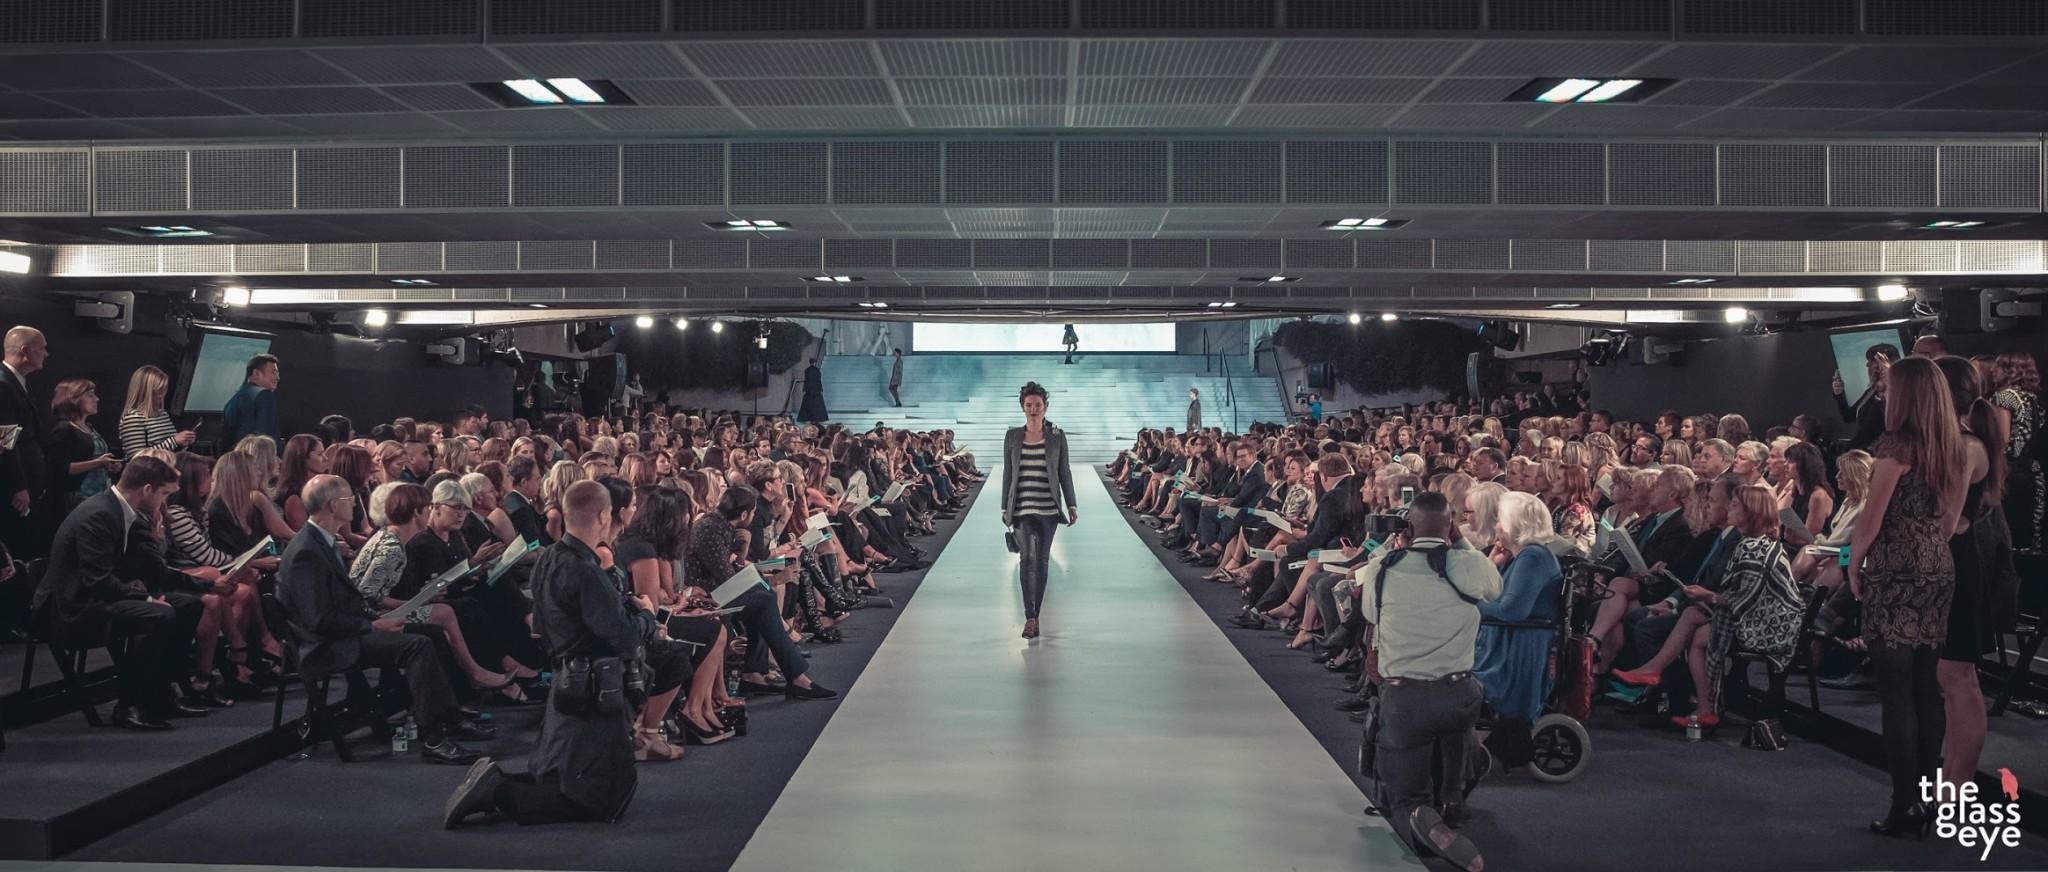 TGE_Nordstrom_FashionShow_VCB-021